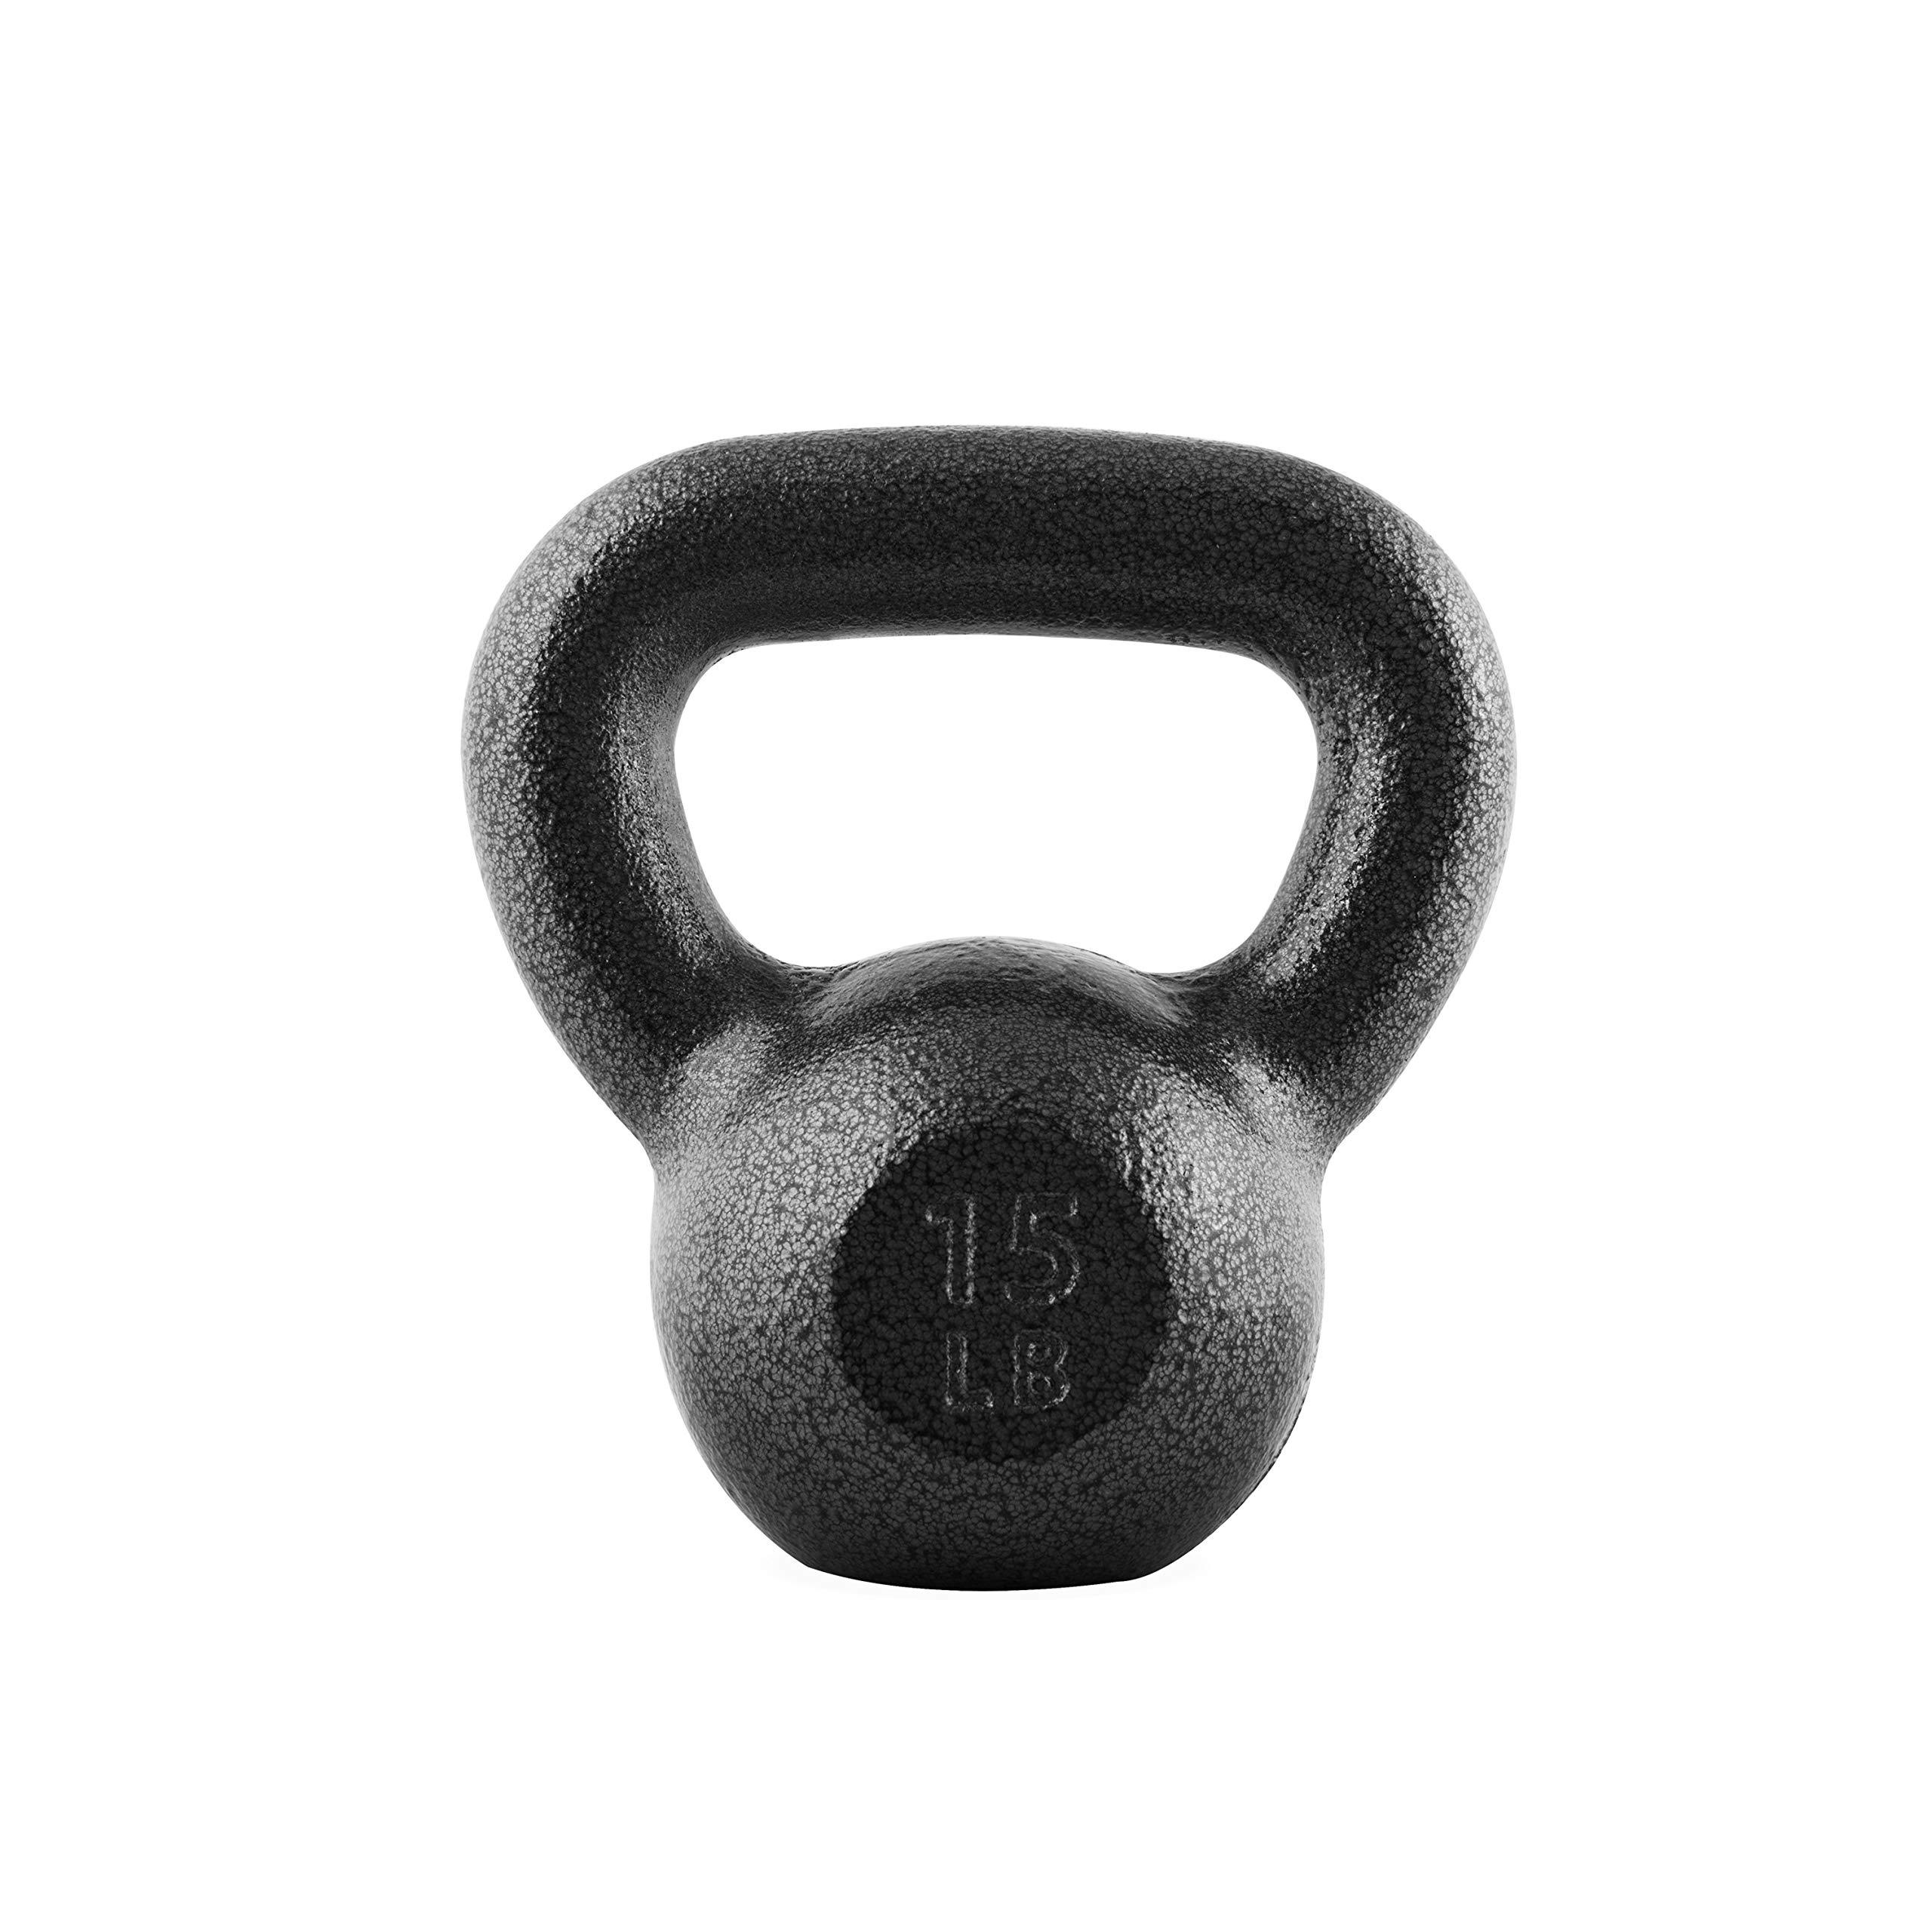 CAP Barbell SDK2B-015 Cast Iron Kettlebell, 15 lb, Black